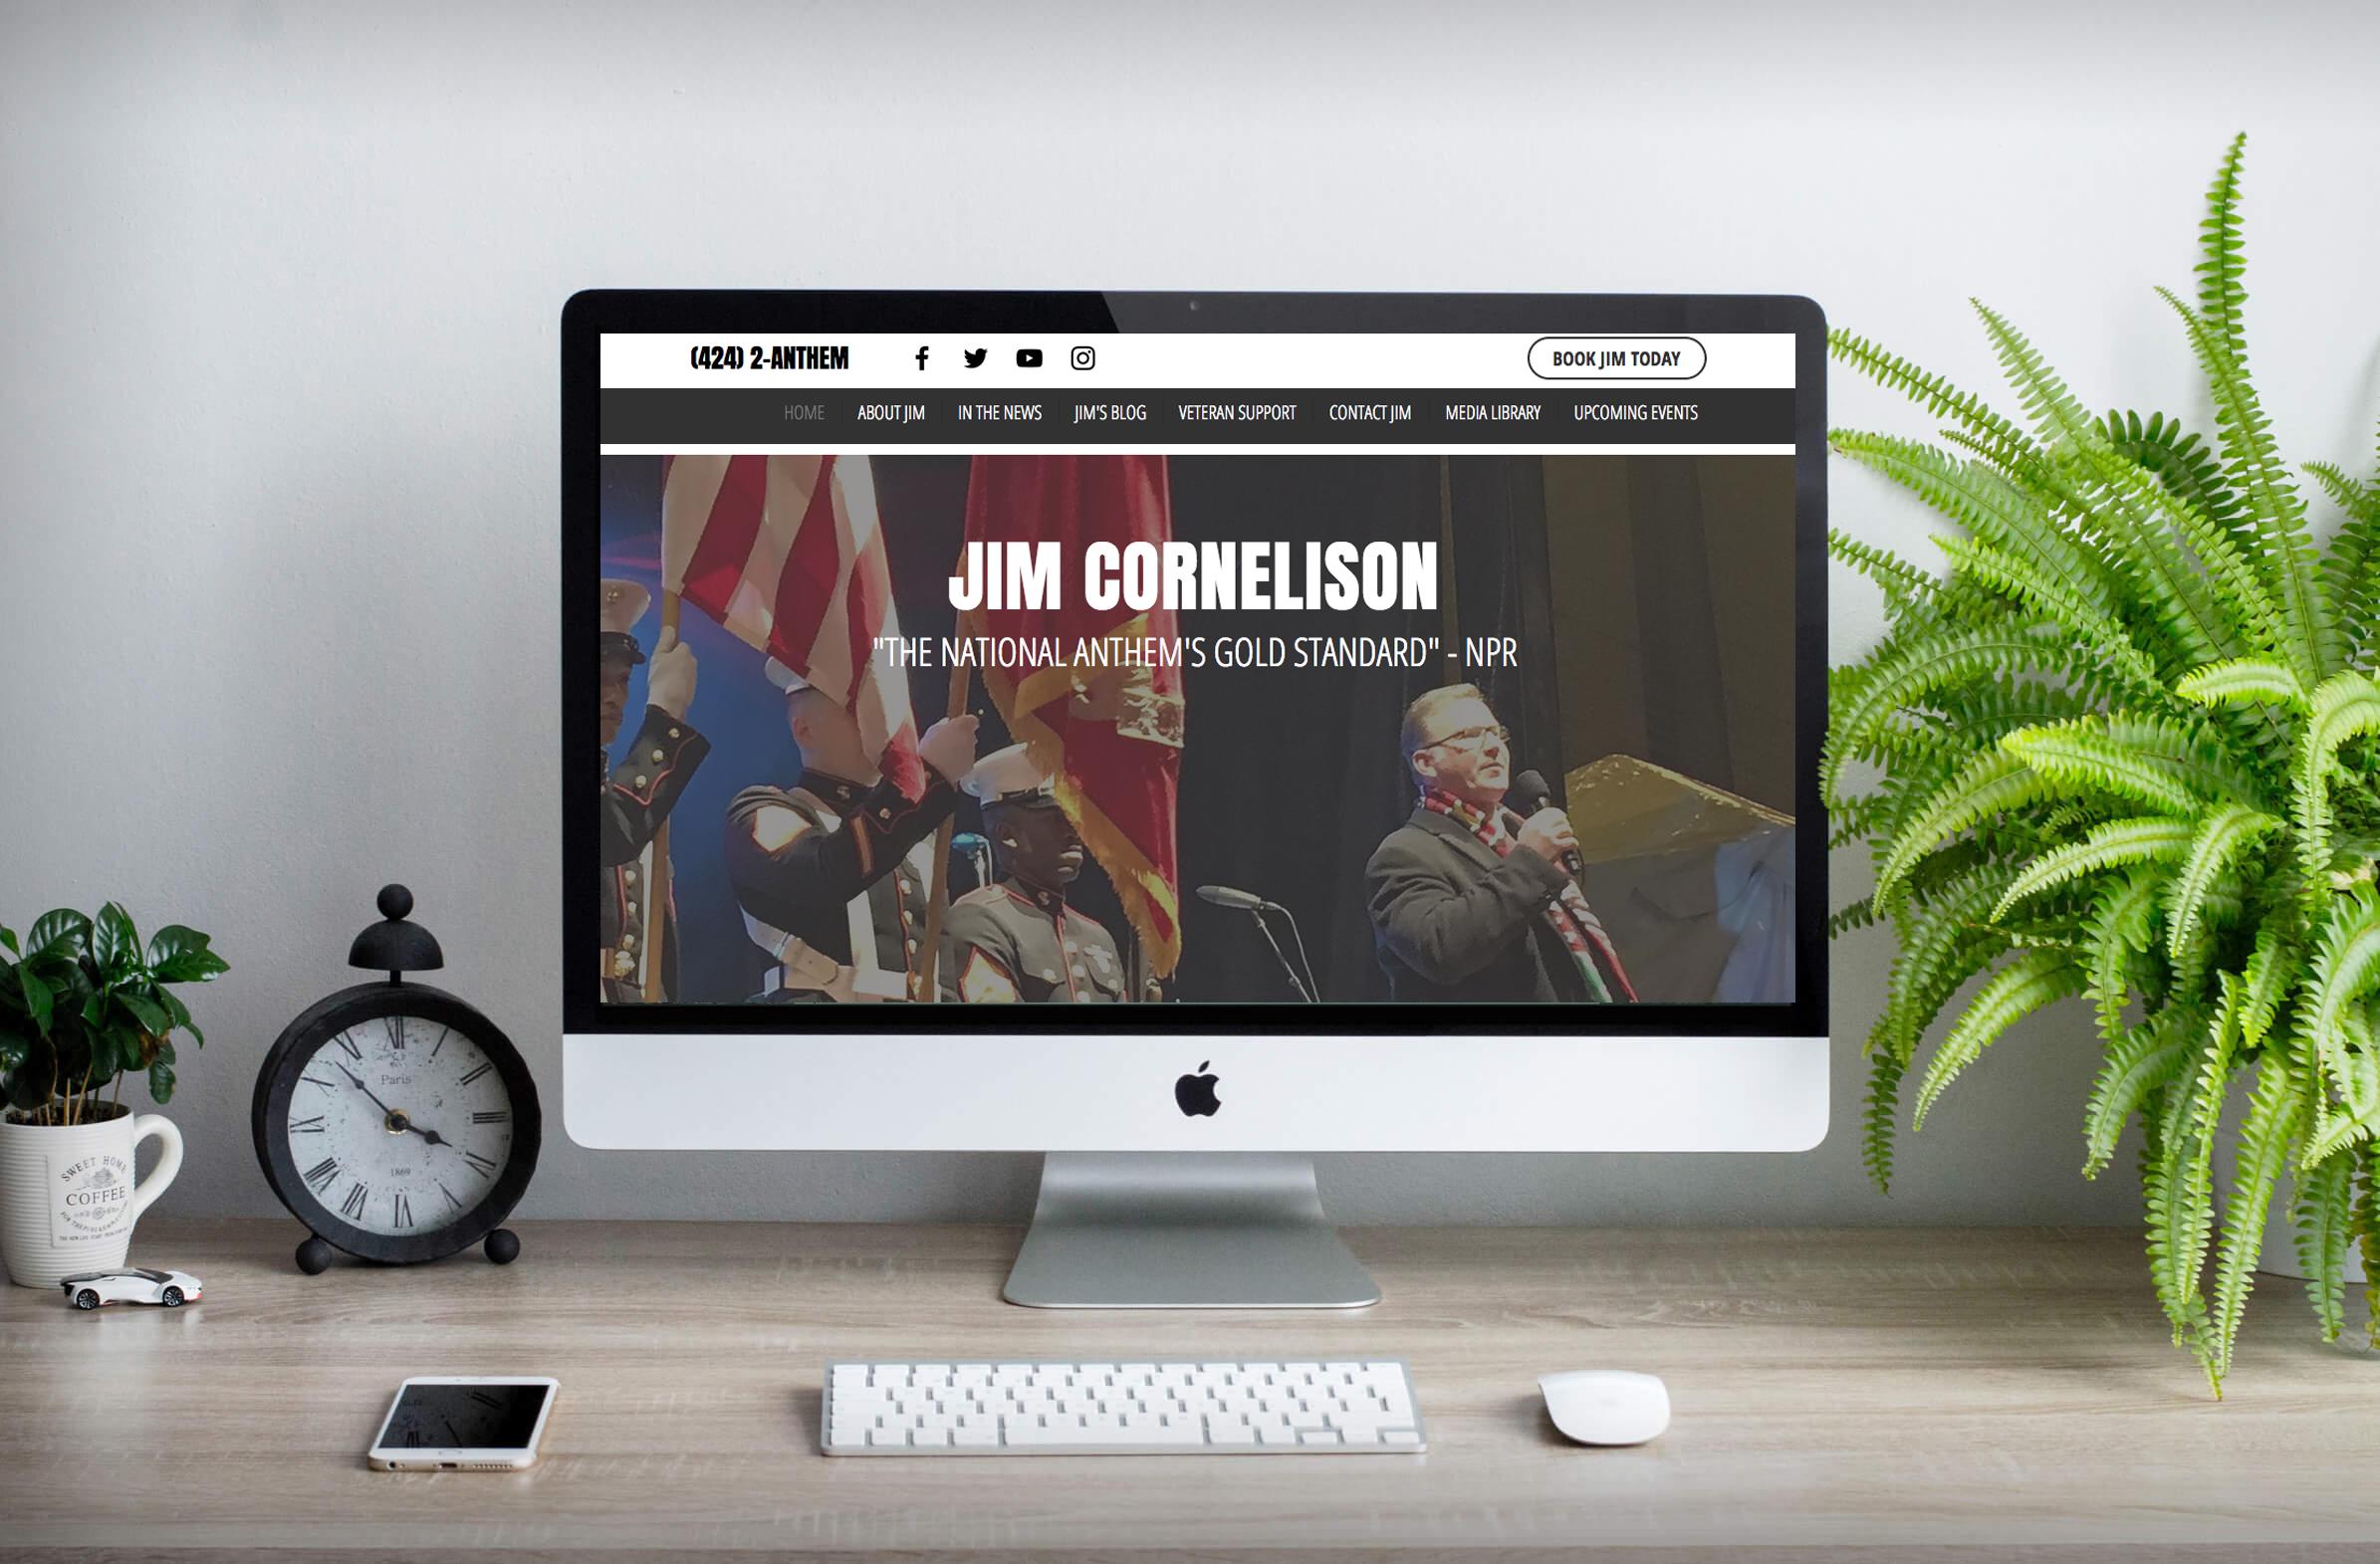 JIM CORNELISON